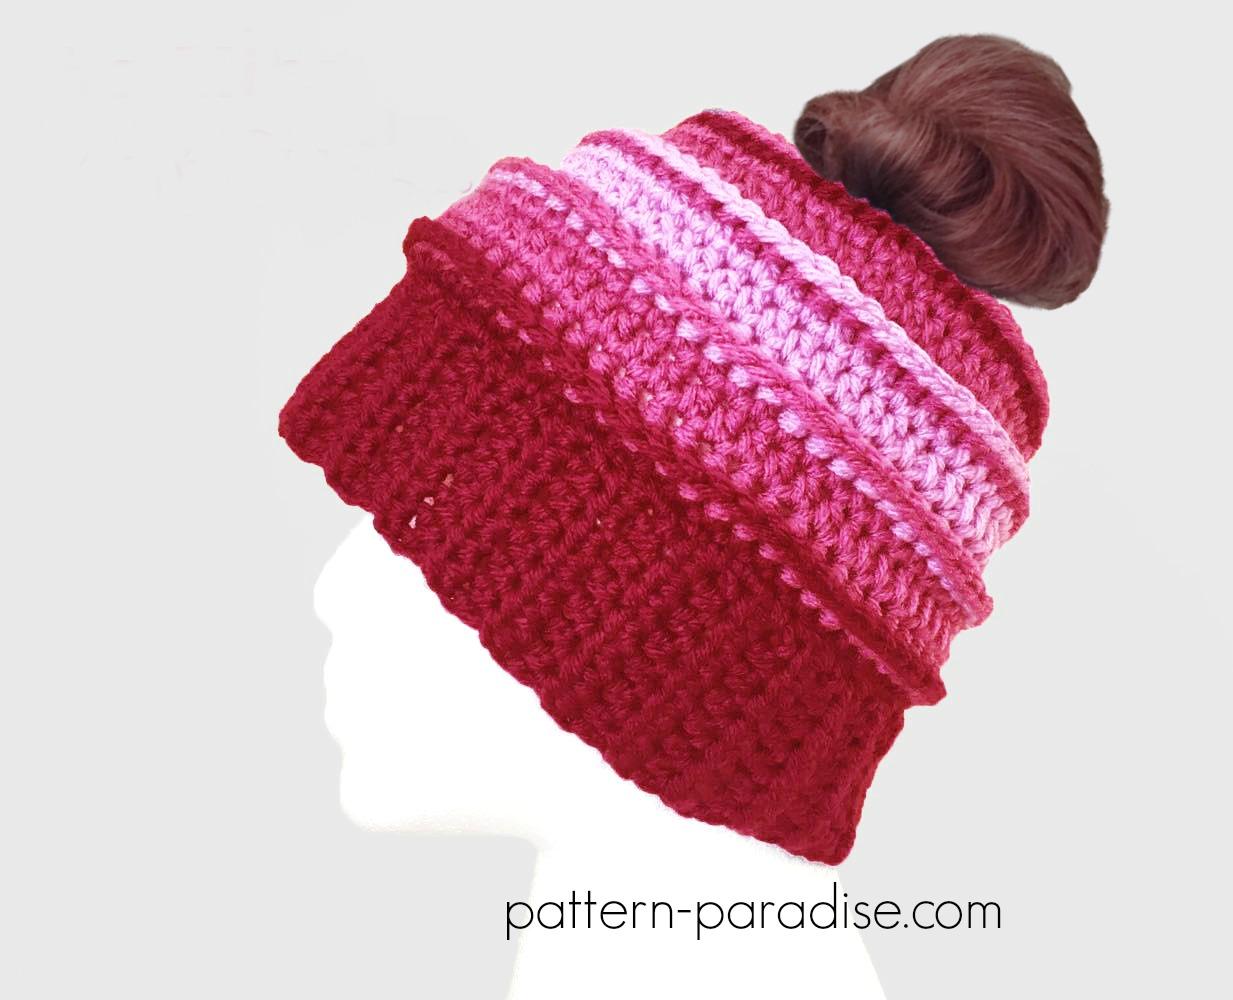 Free Crochet Pattern  Be Mine Messy Bun Hat  999a9c5b2